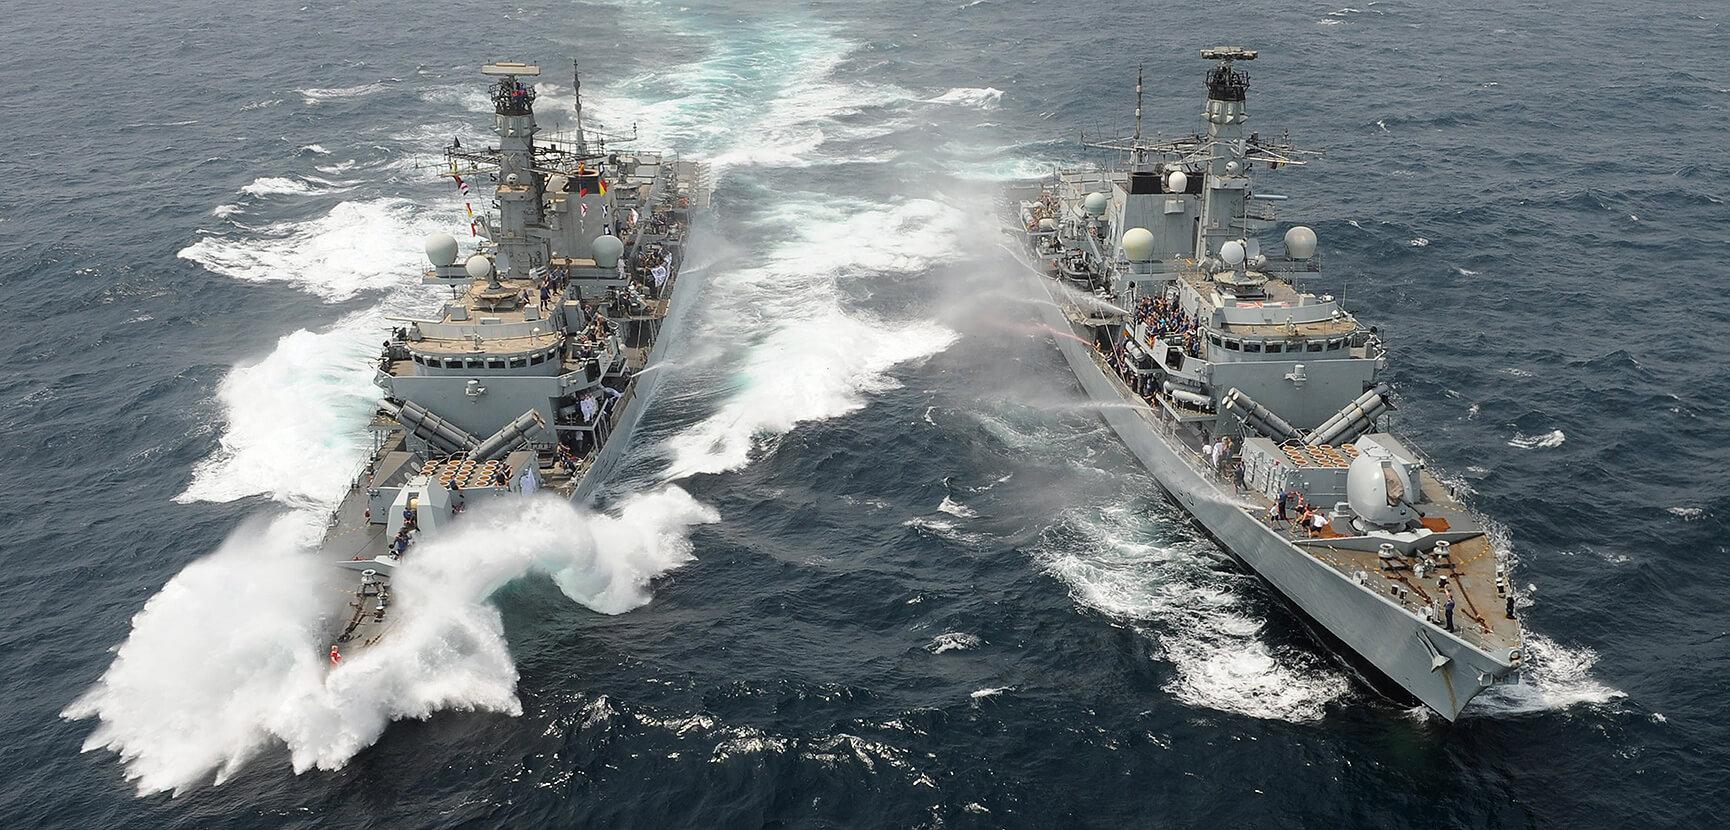 HMS Iron Duke and HMS St Albans